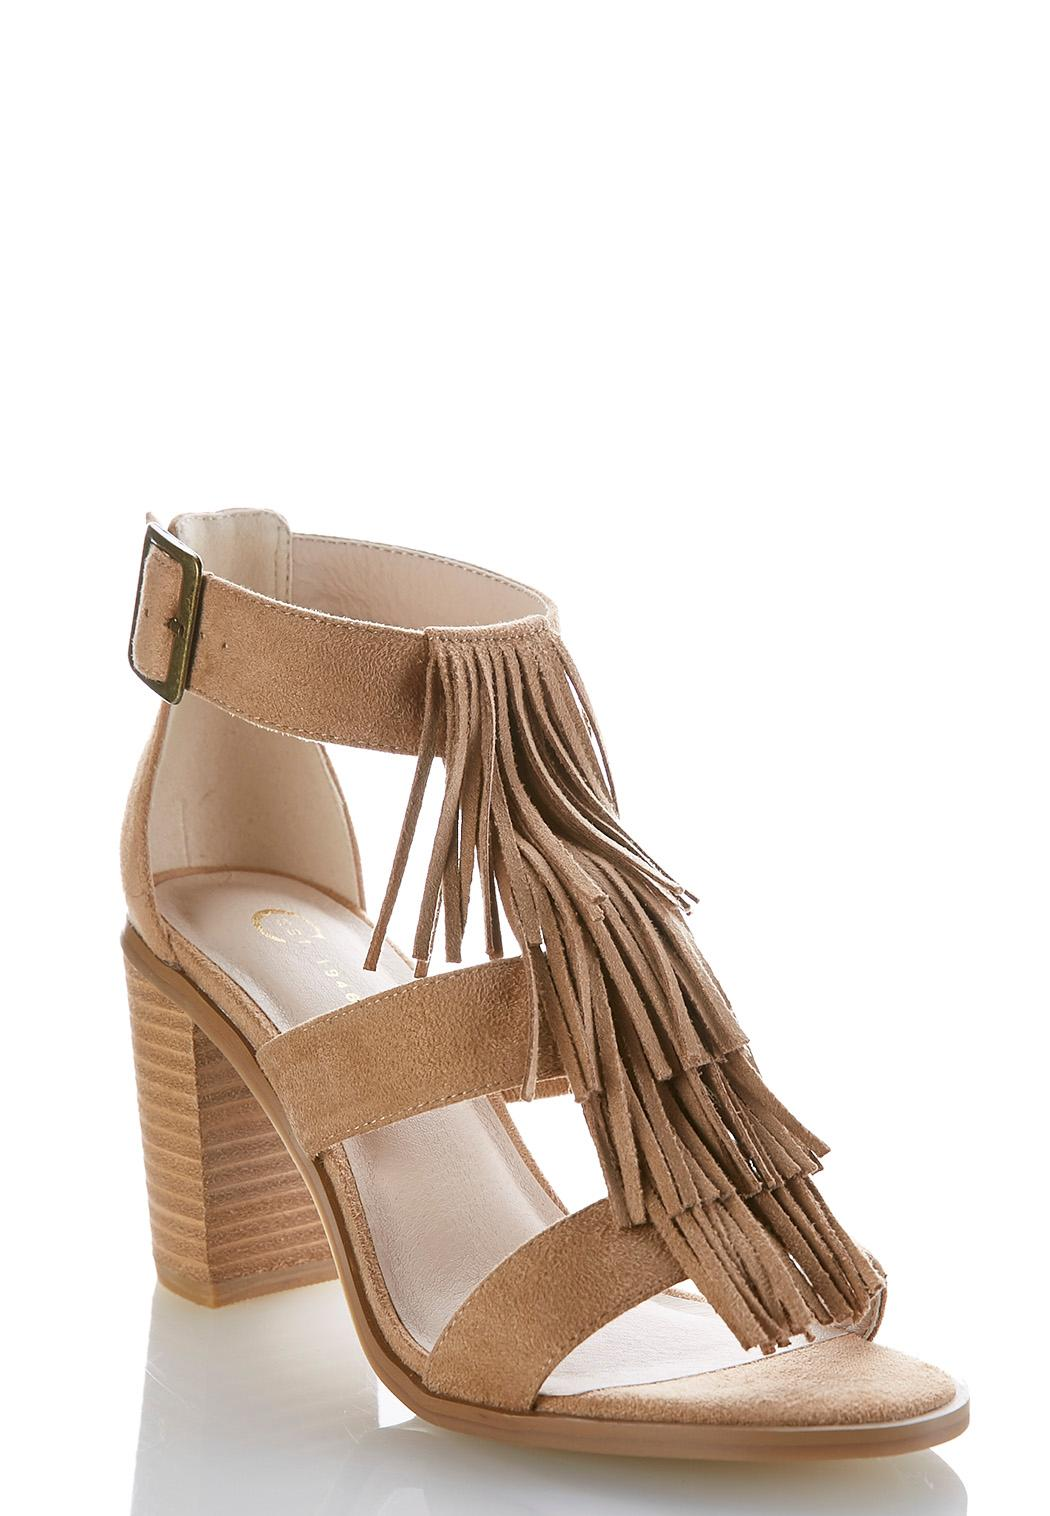 d647774e5 Fringe Vamp Heeled Sandals Heels Cato Fashions